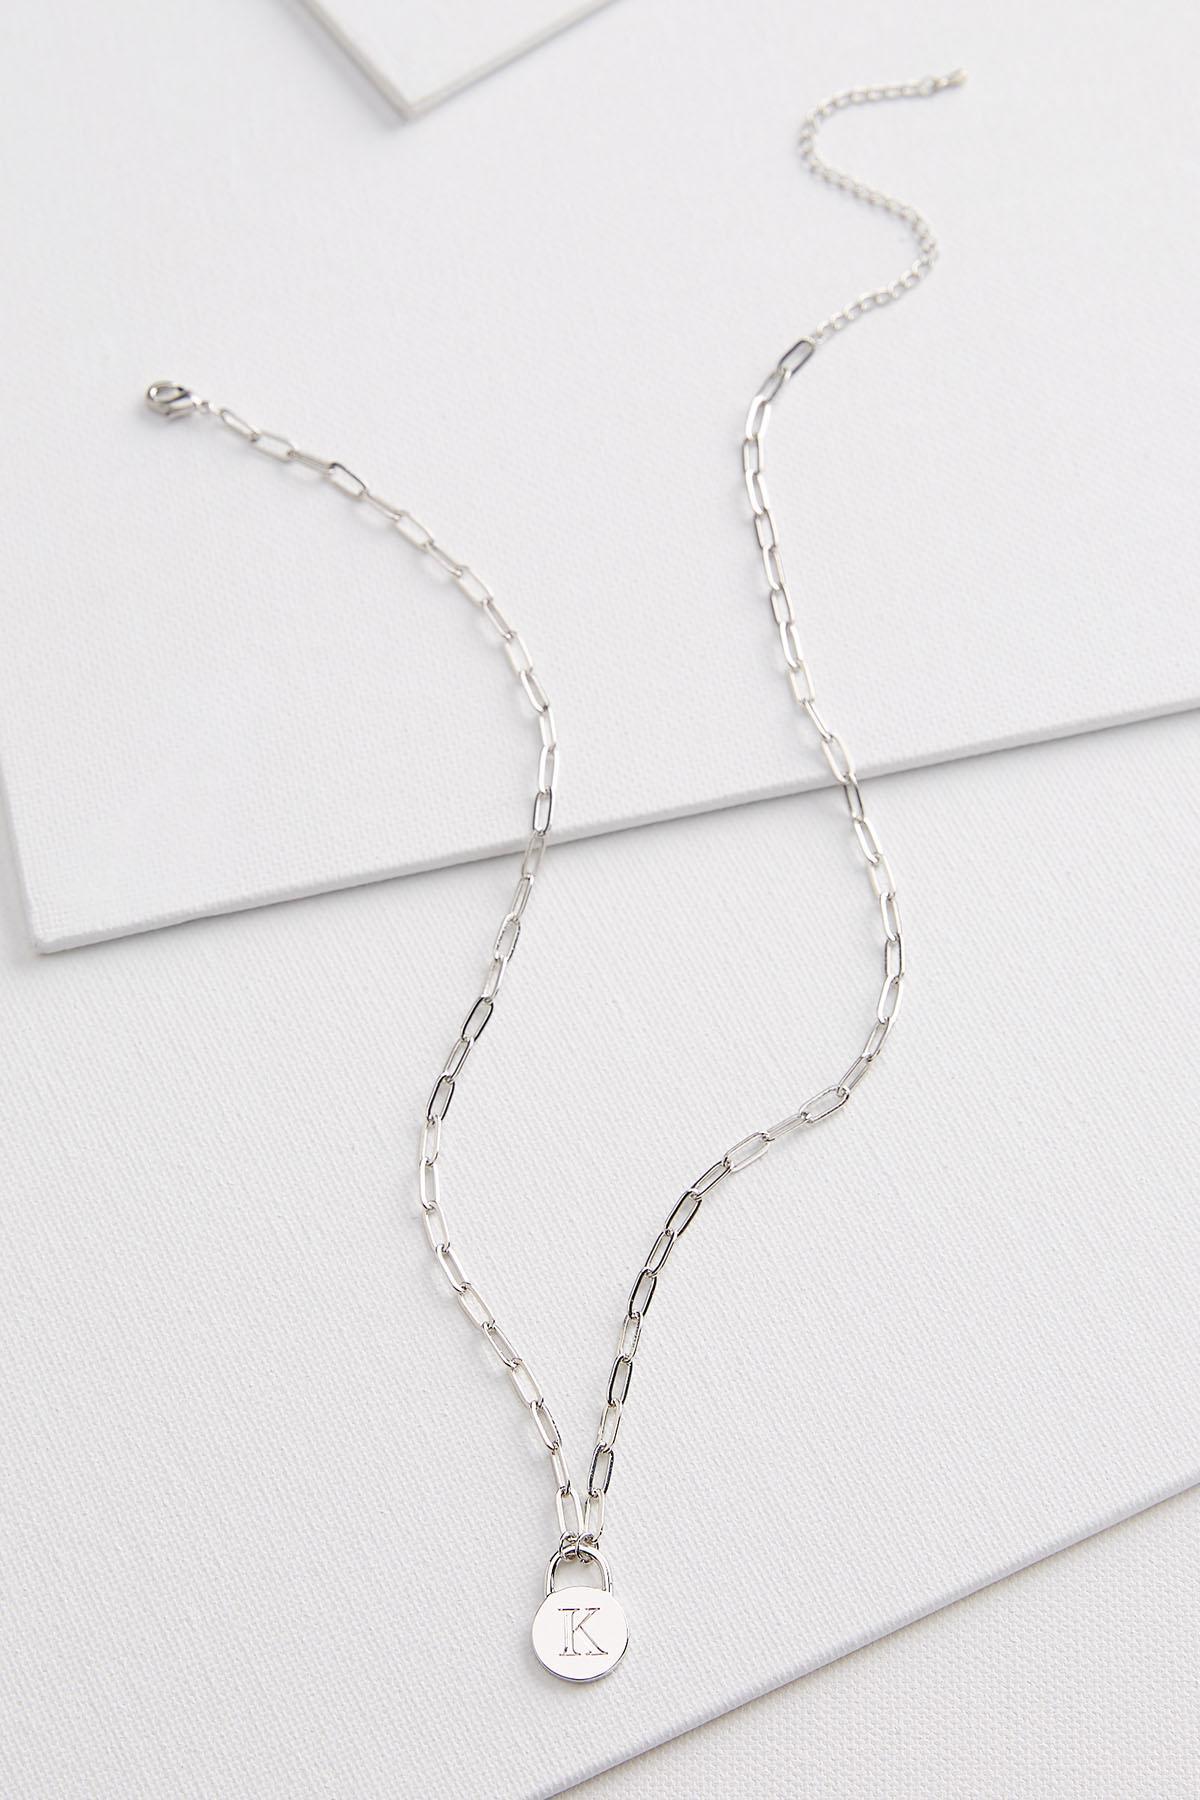 Silver K Necklace